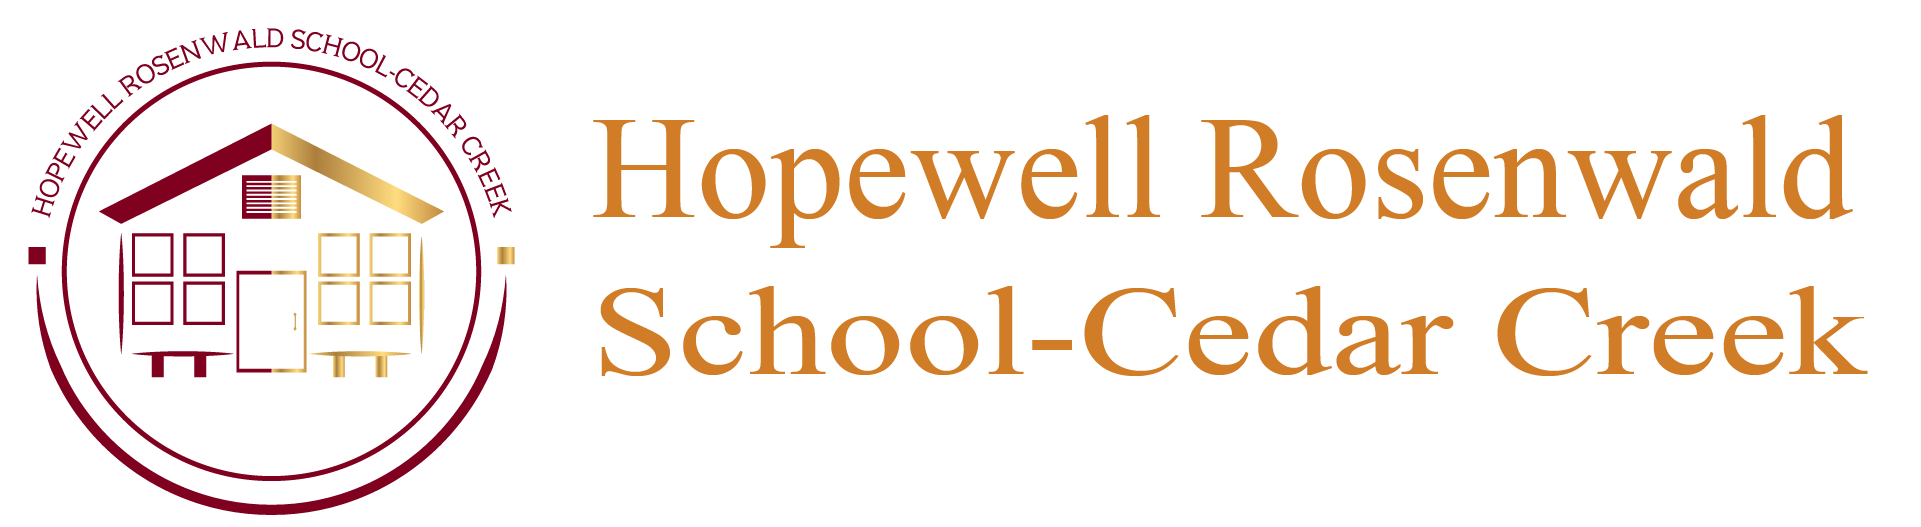 Hopewell Rosenwald School